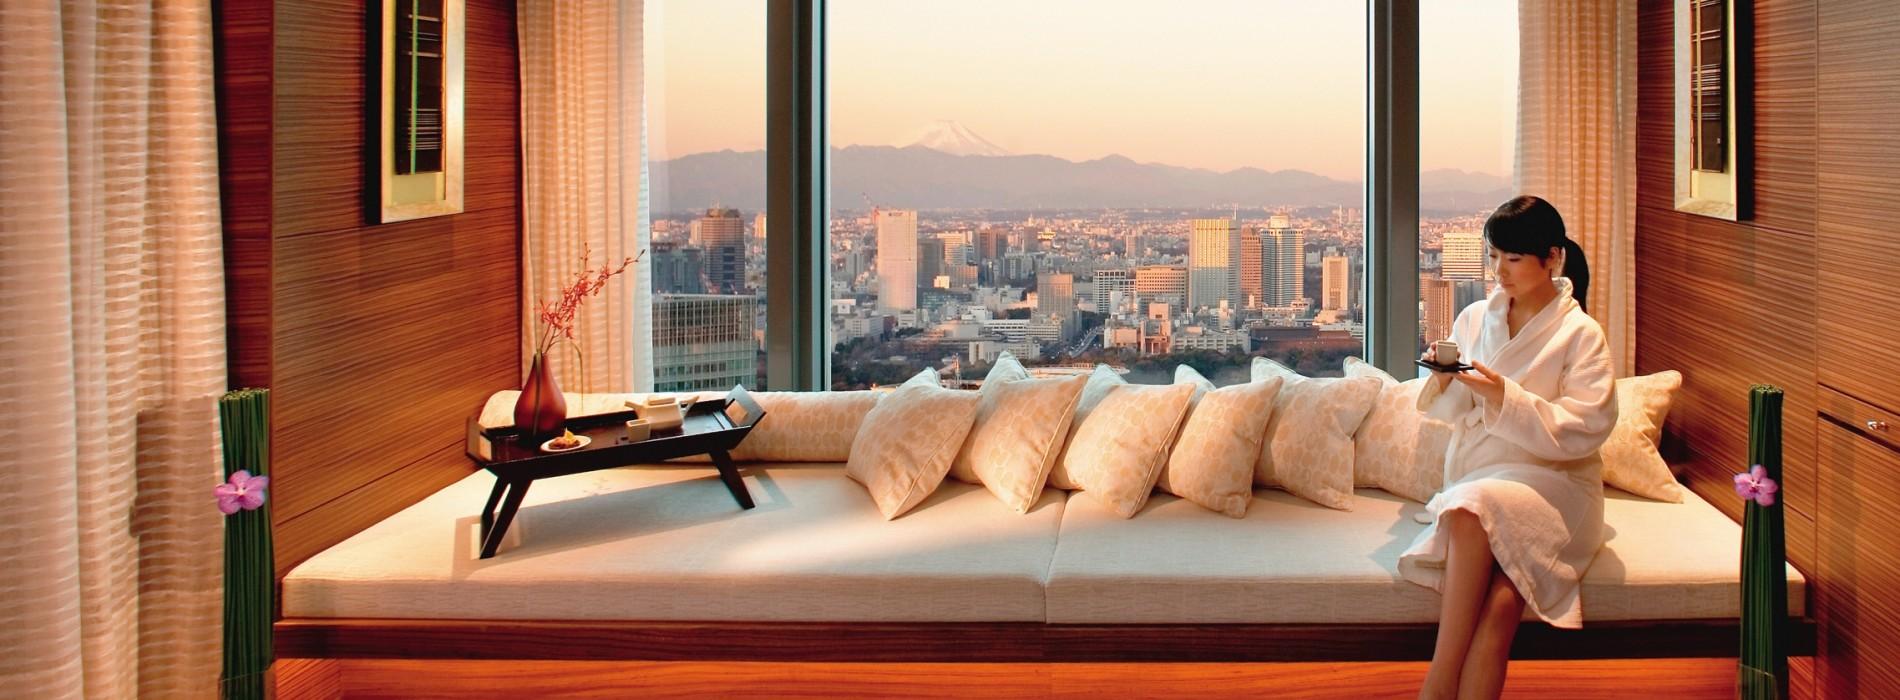 The Spa at Mandarin Oriental, Tokyo offers Sakura Treatments for Spring